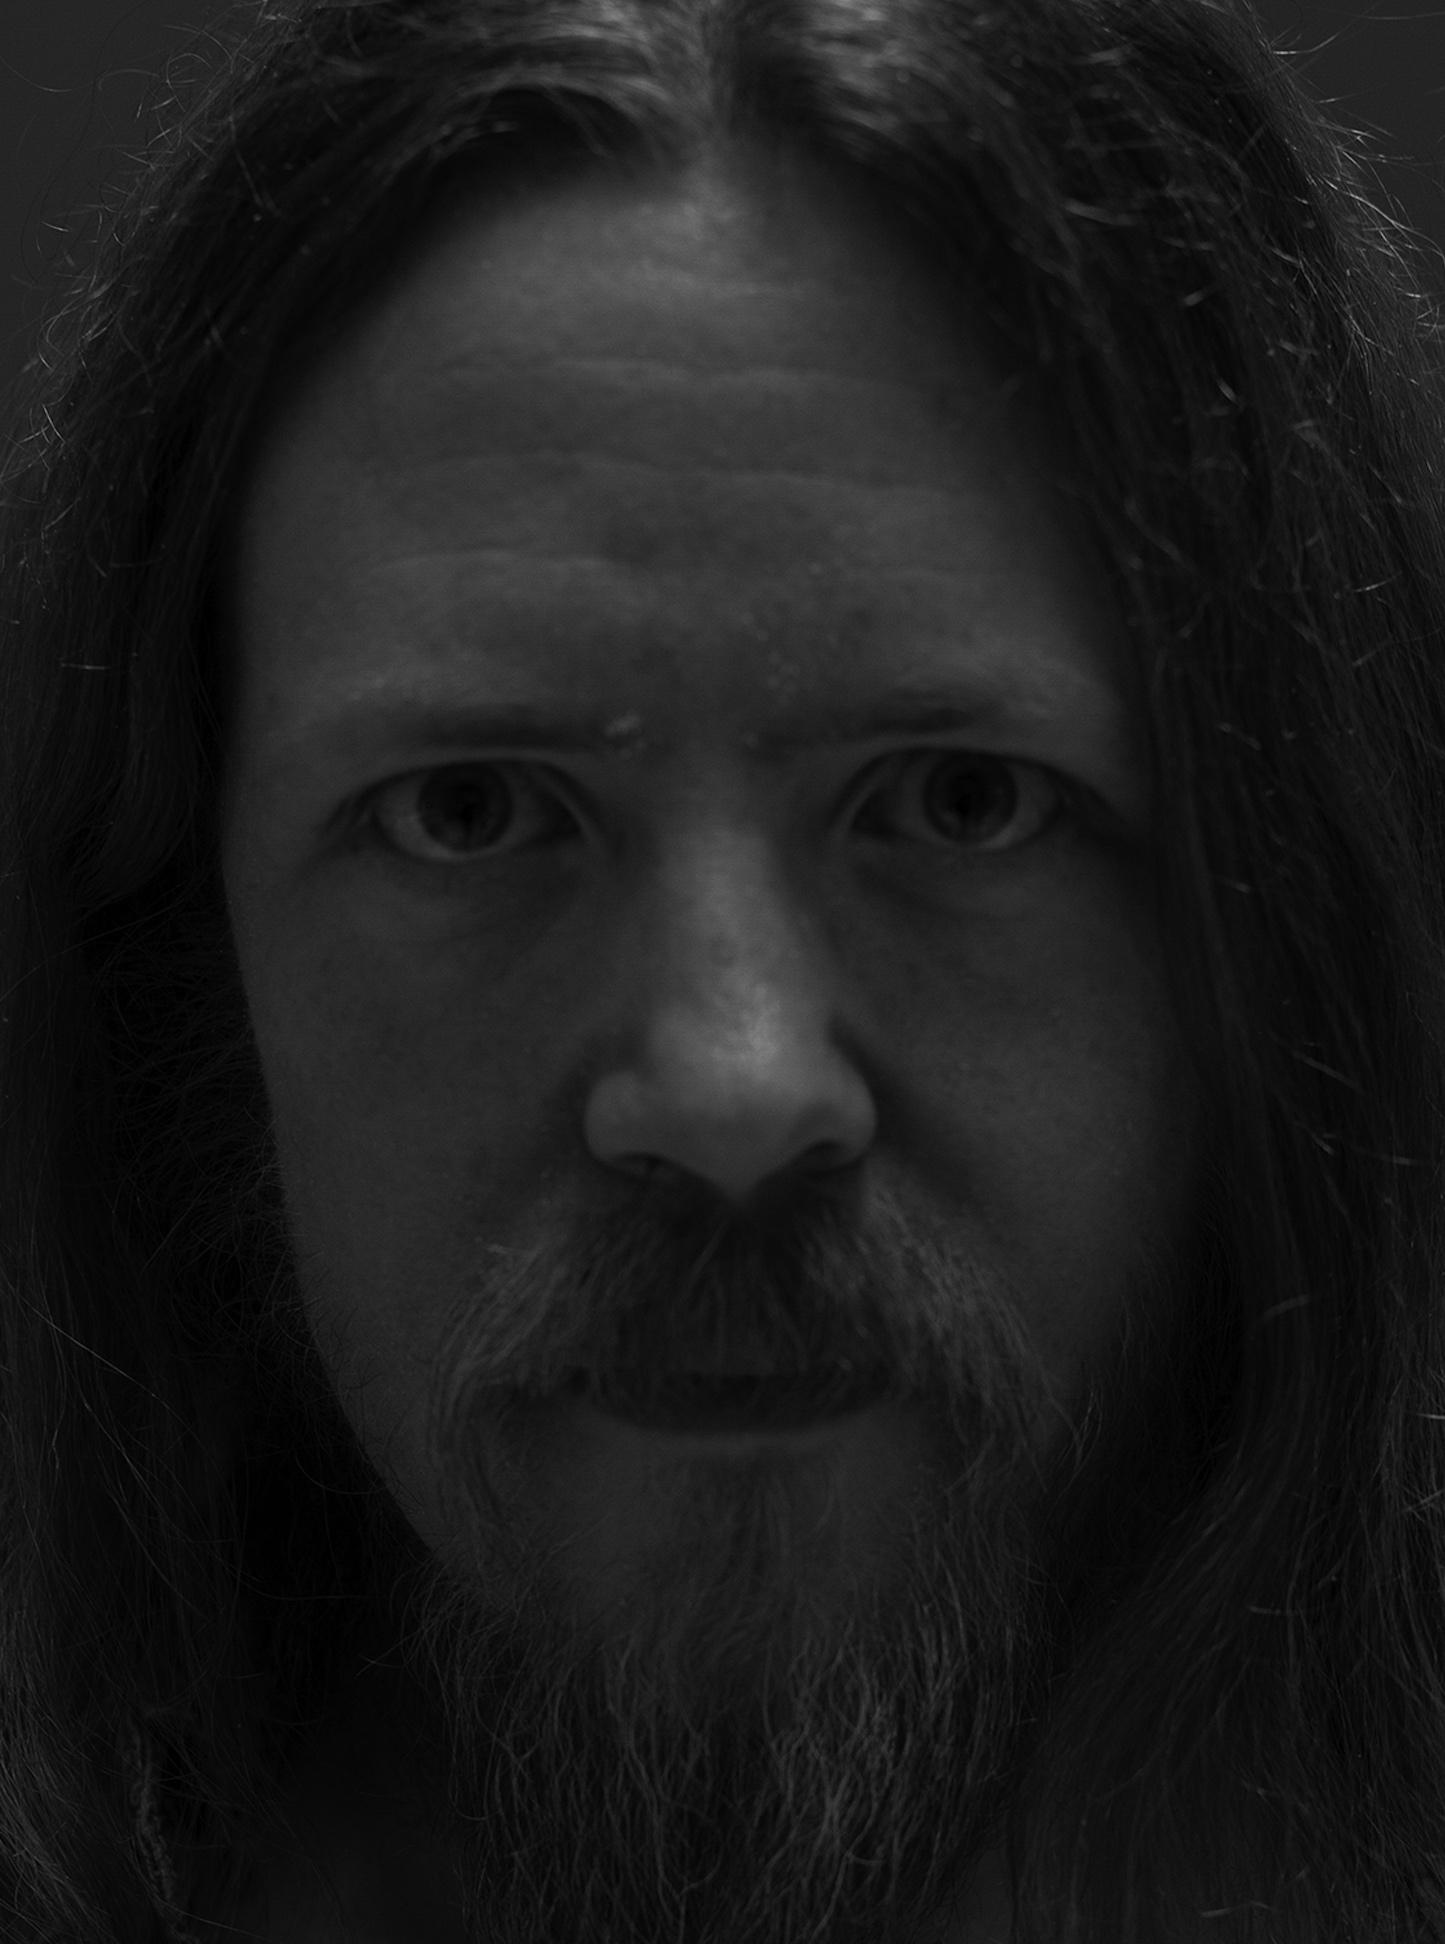 Gimse - Dark Lyrics, Visions of Gloom, Vocals and Gutteral Screams.